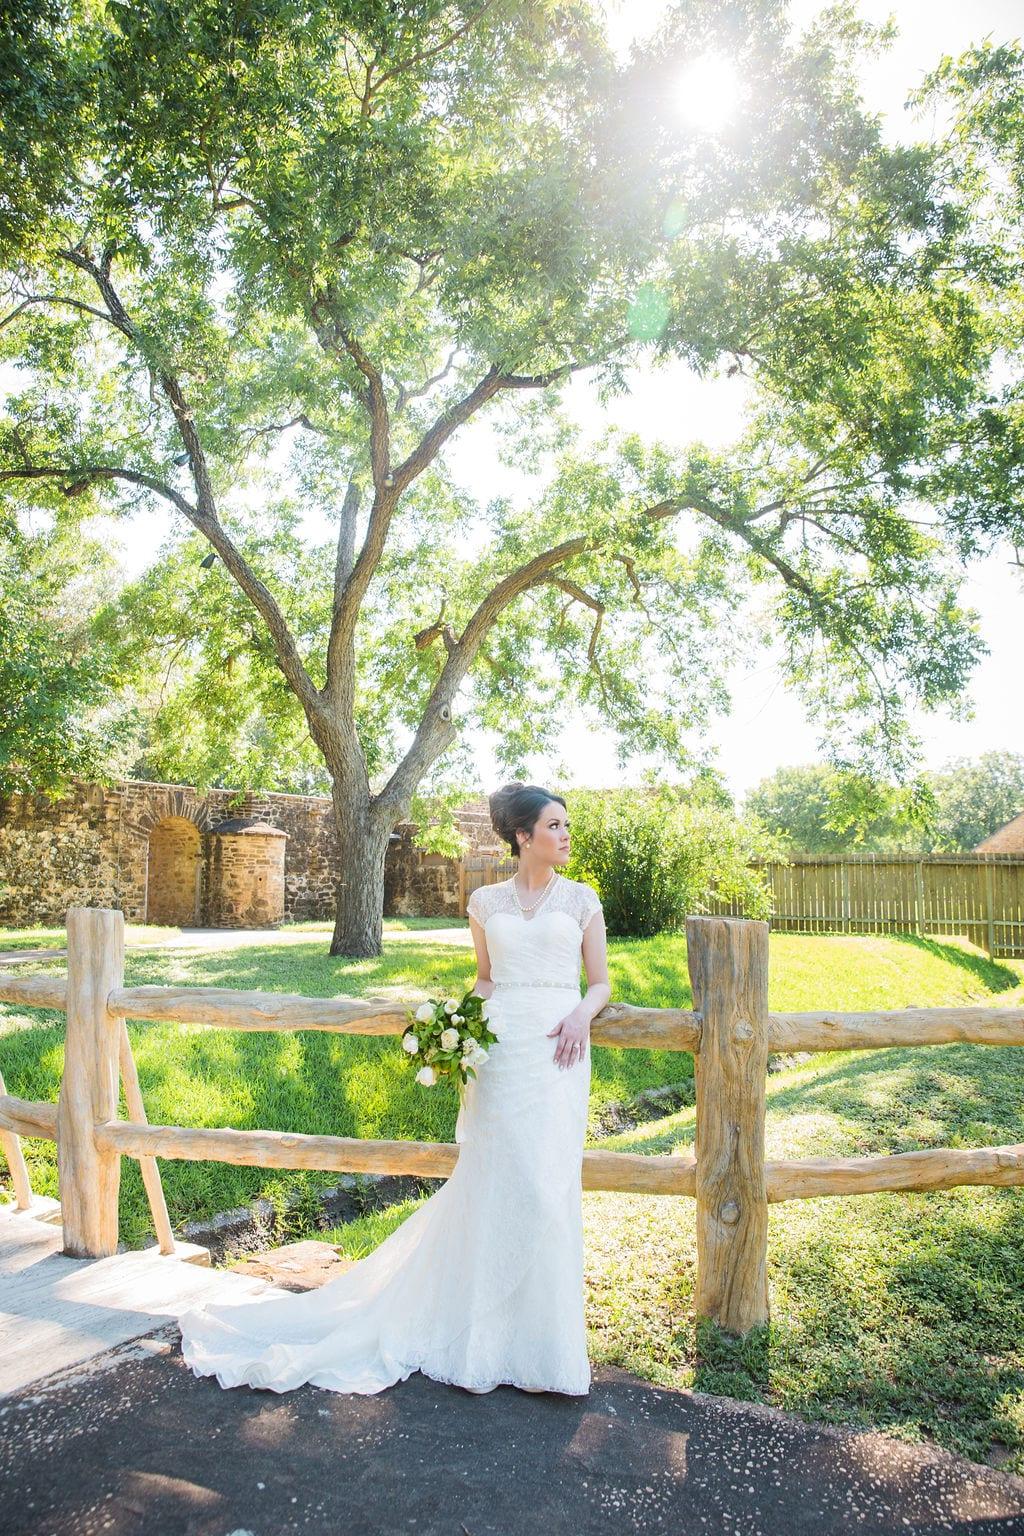 Aamber's bridal - mission San Jose on the bridge